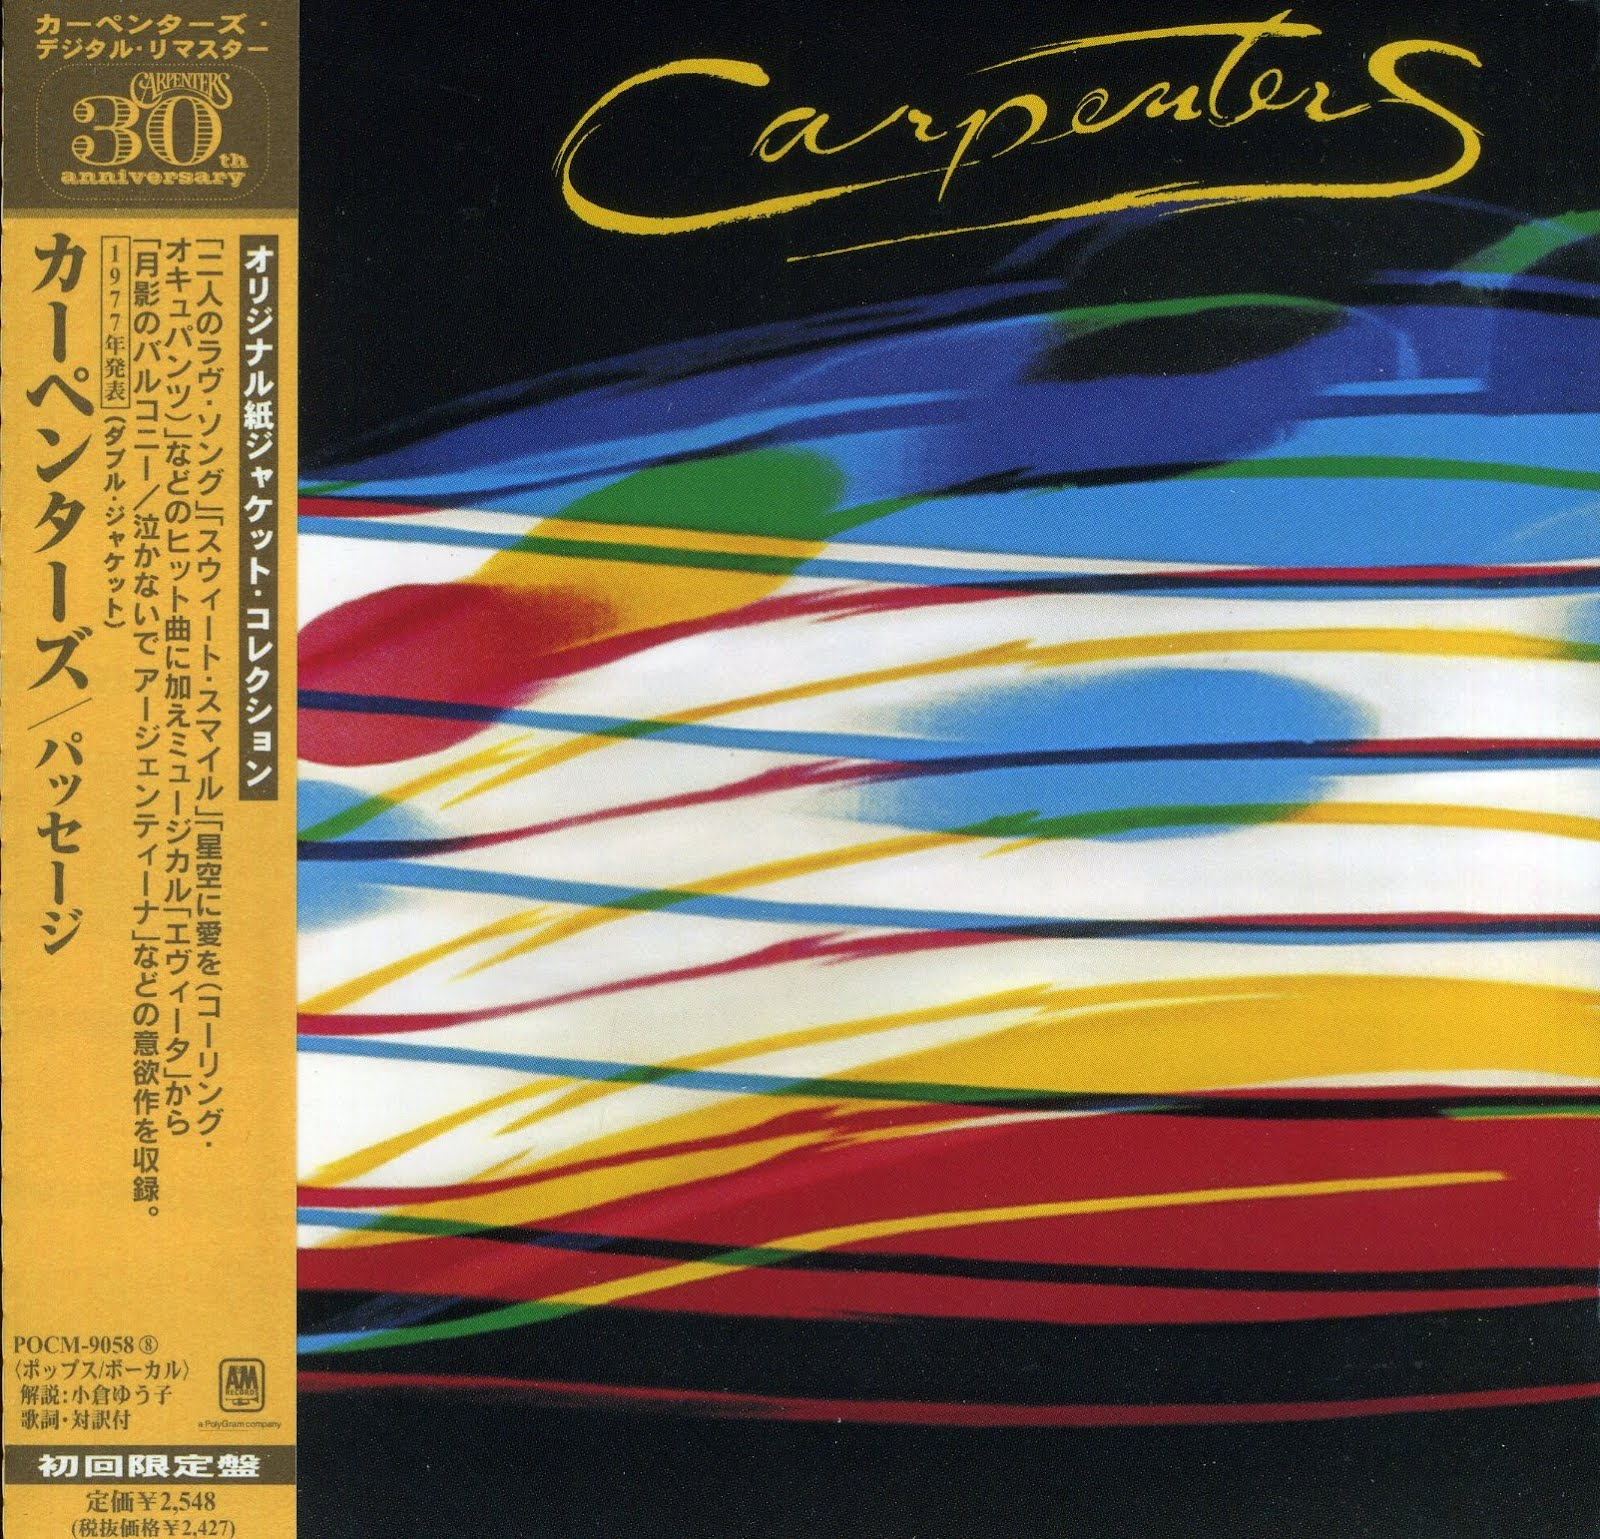 Carpenters Passage 1977 Japan Print